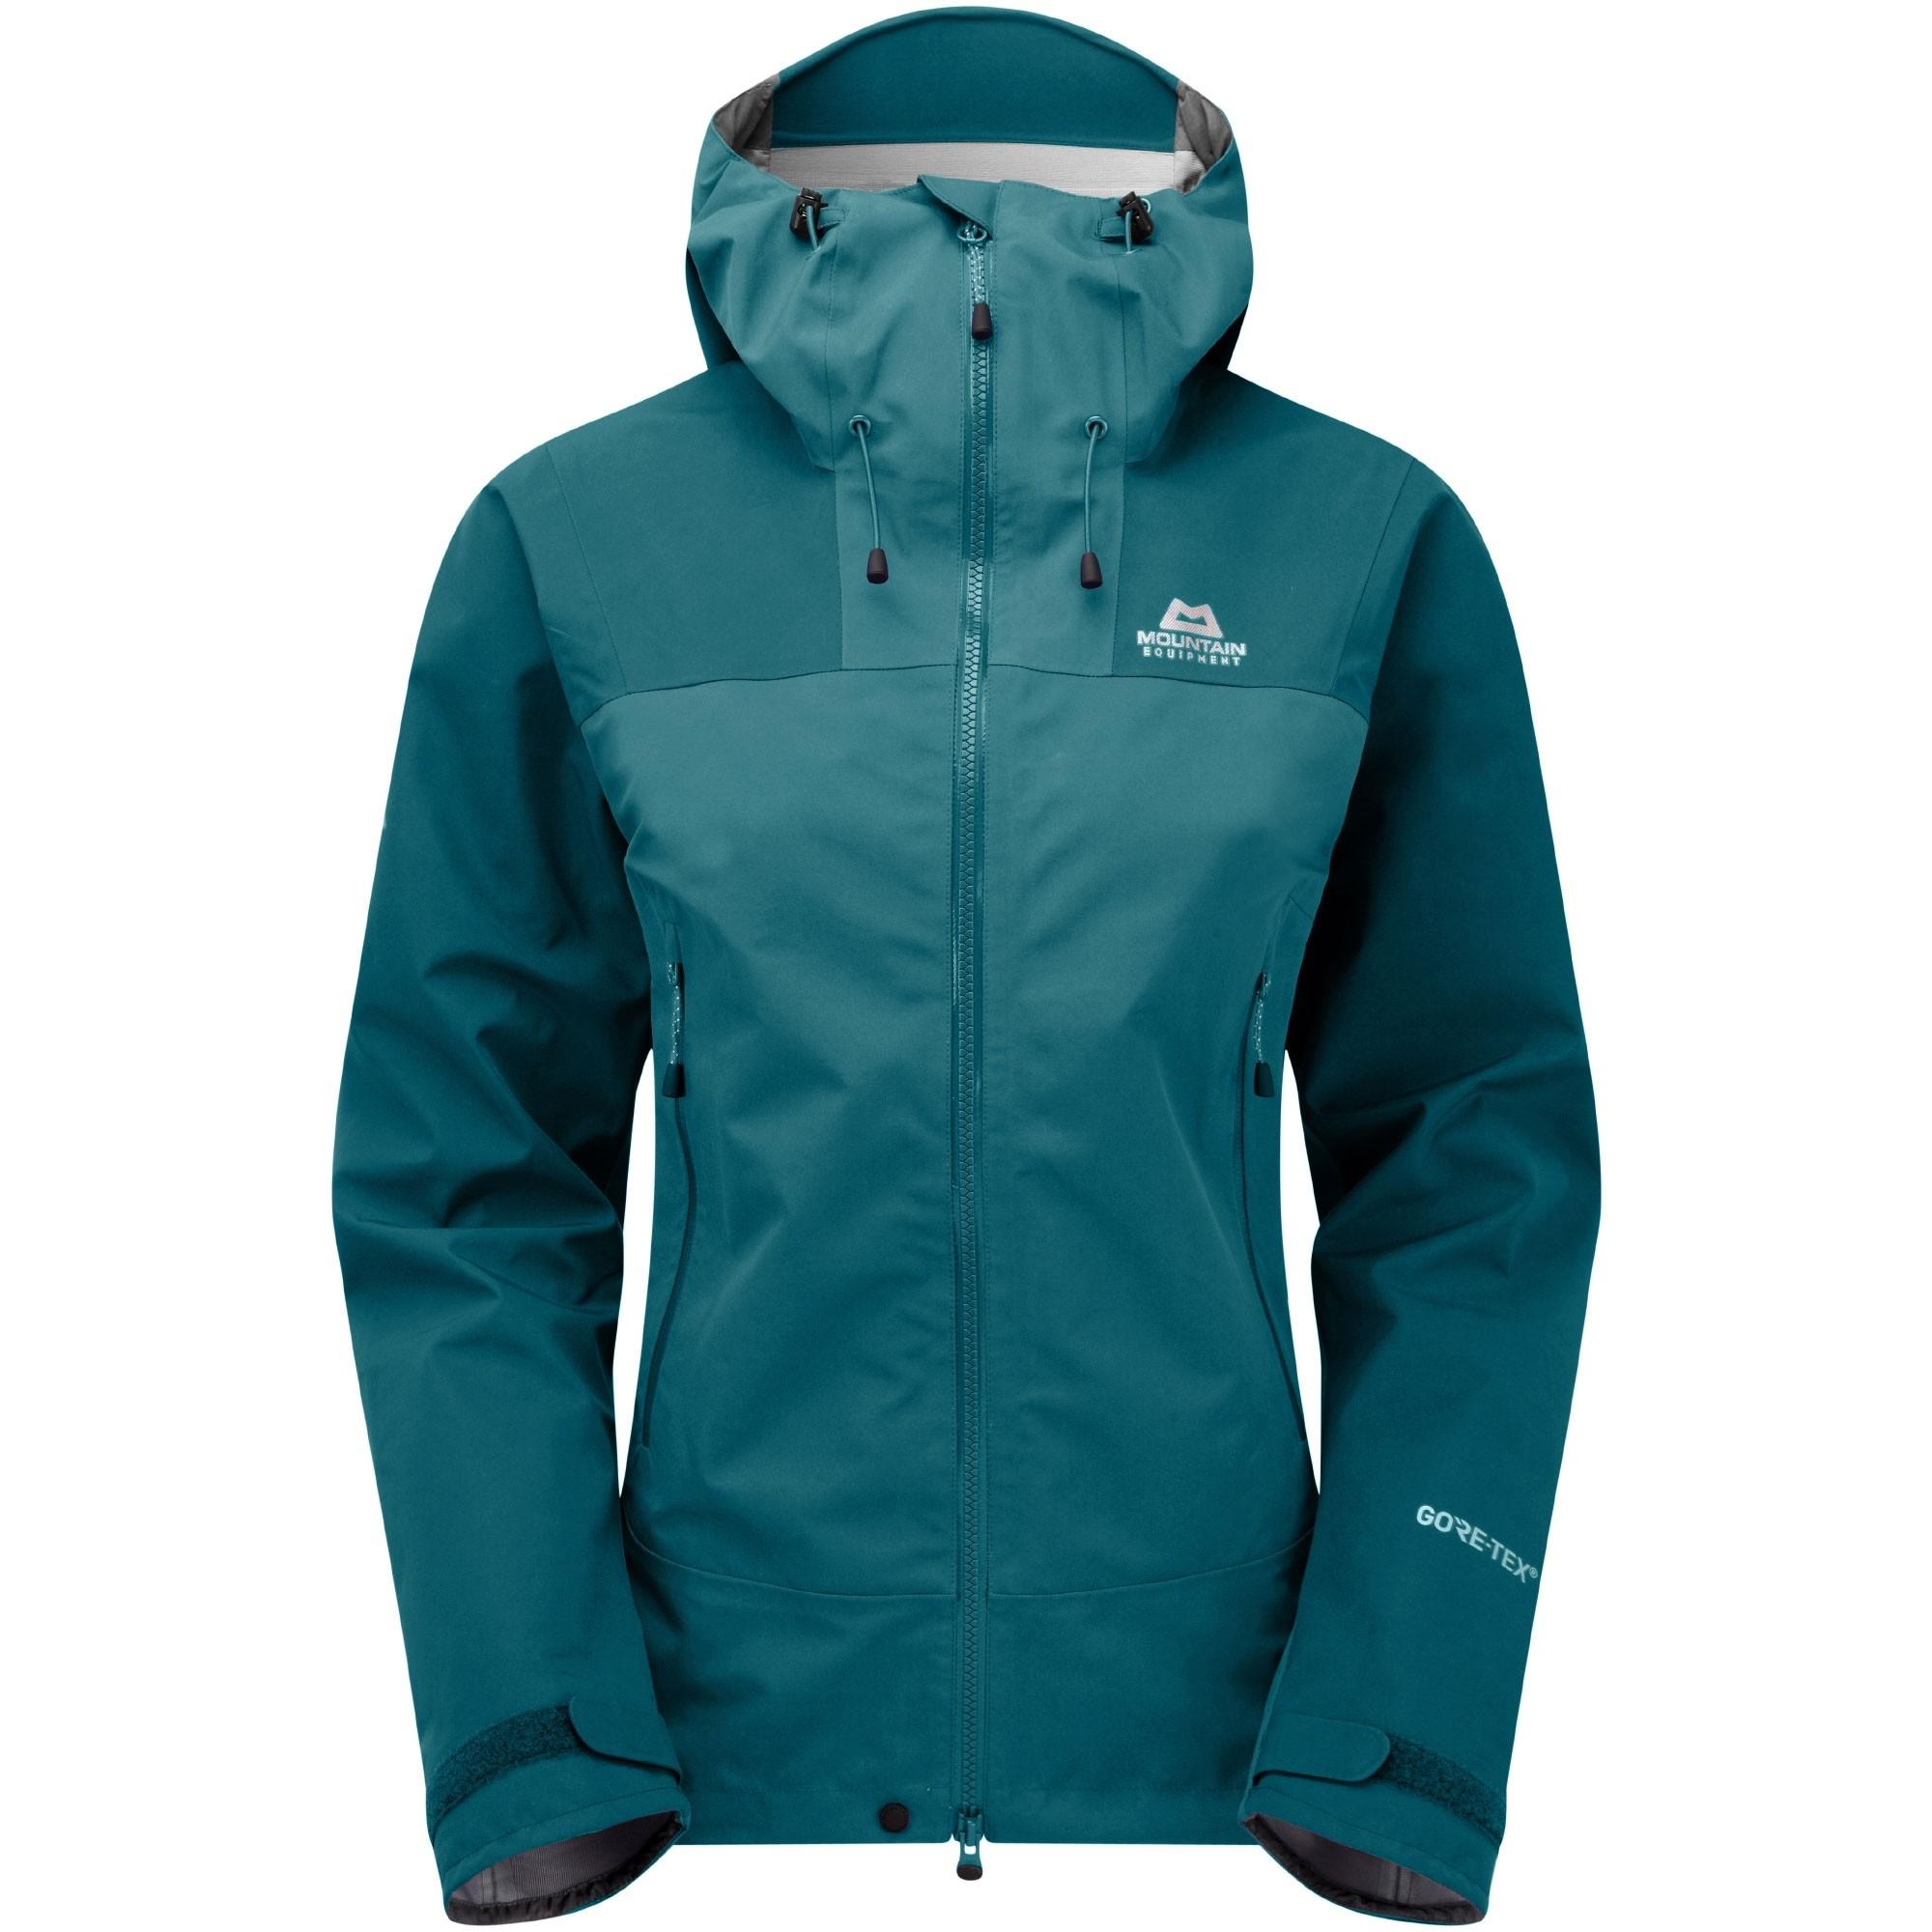 Mountain Equipment Women's Rupal Jacket - Legion Blue